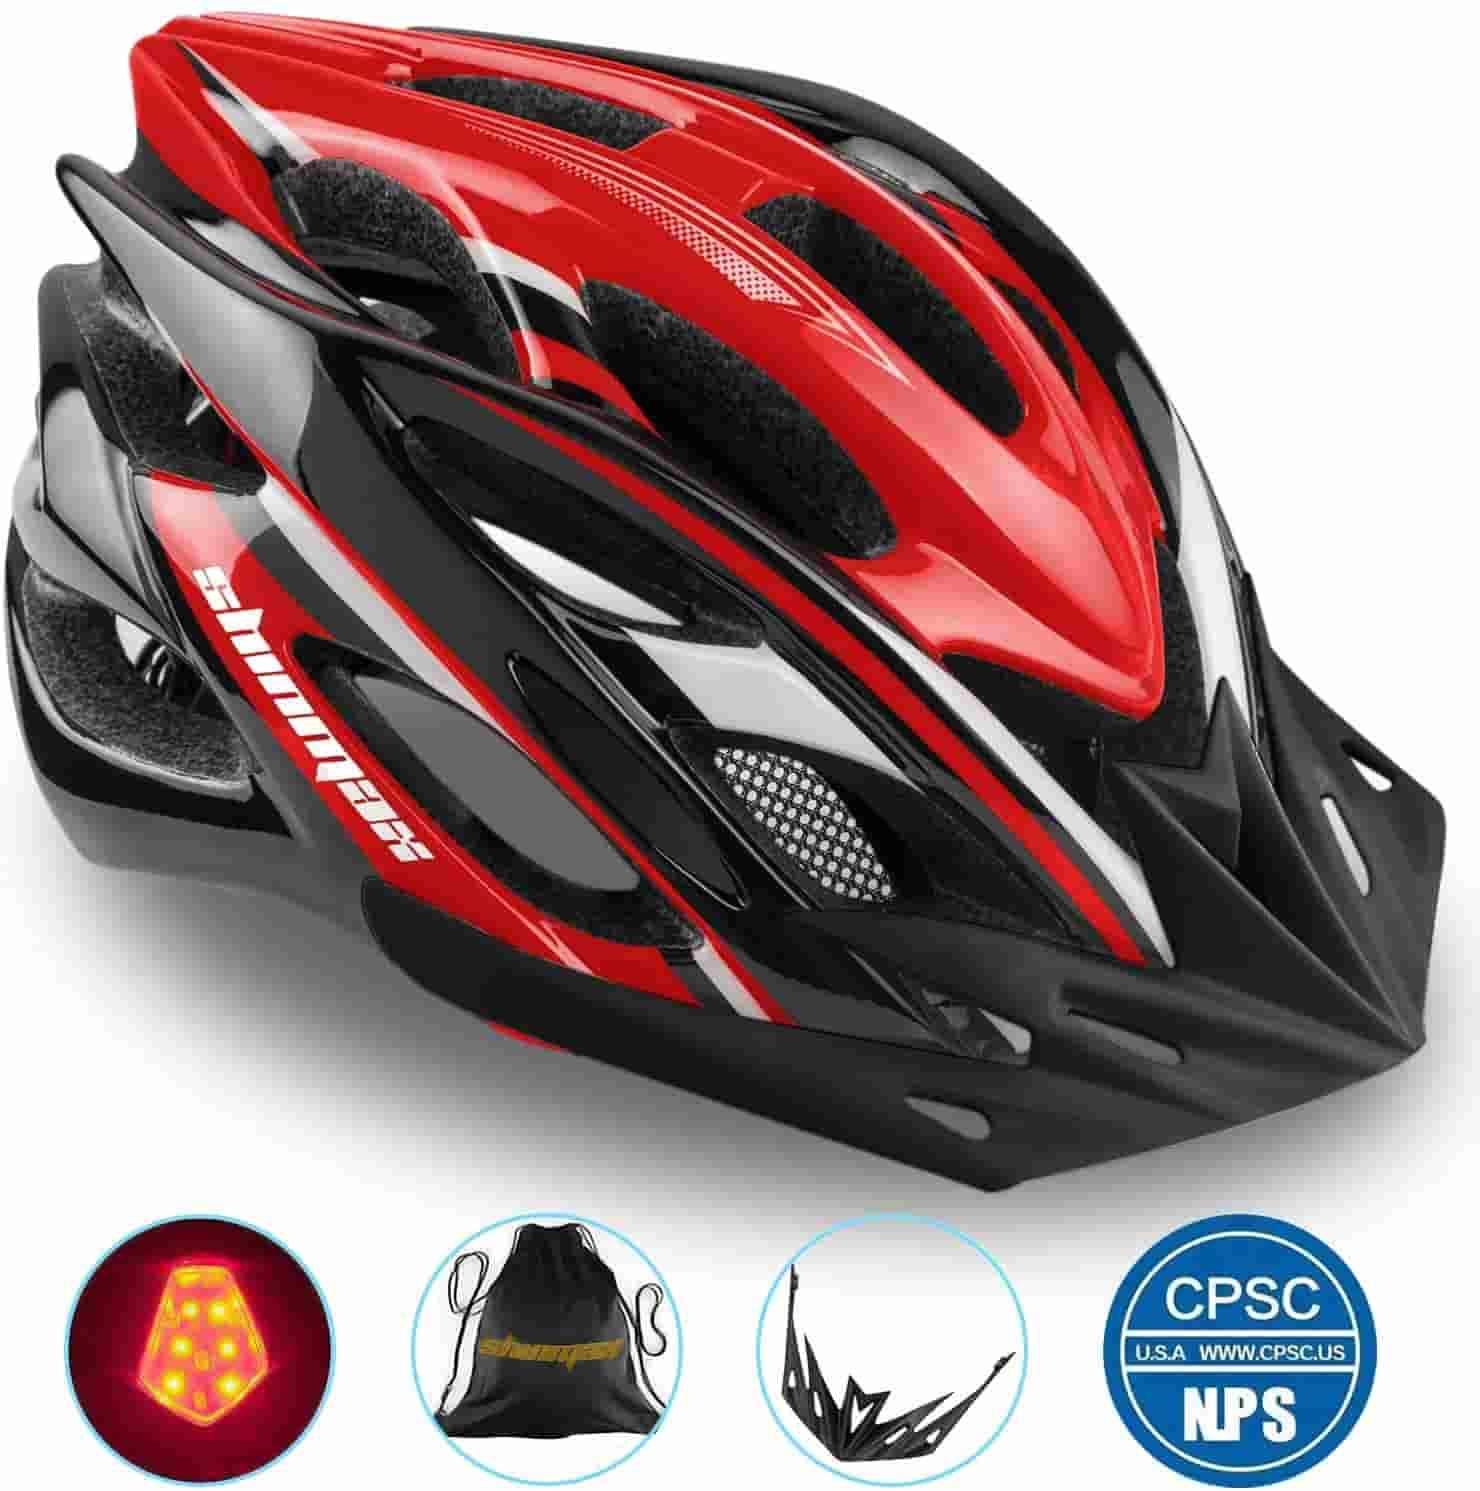 Top 9 Best Road Bike Helmet Under 100 In 2020 Bestcomfortbike